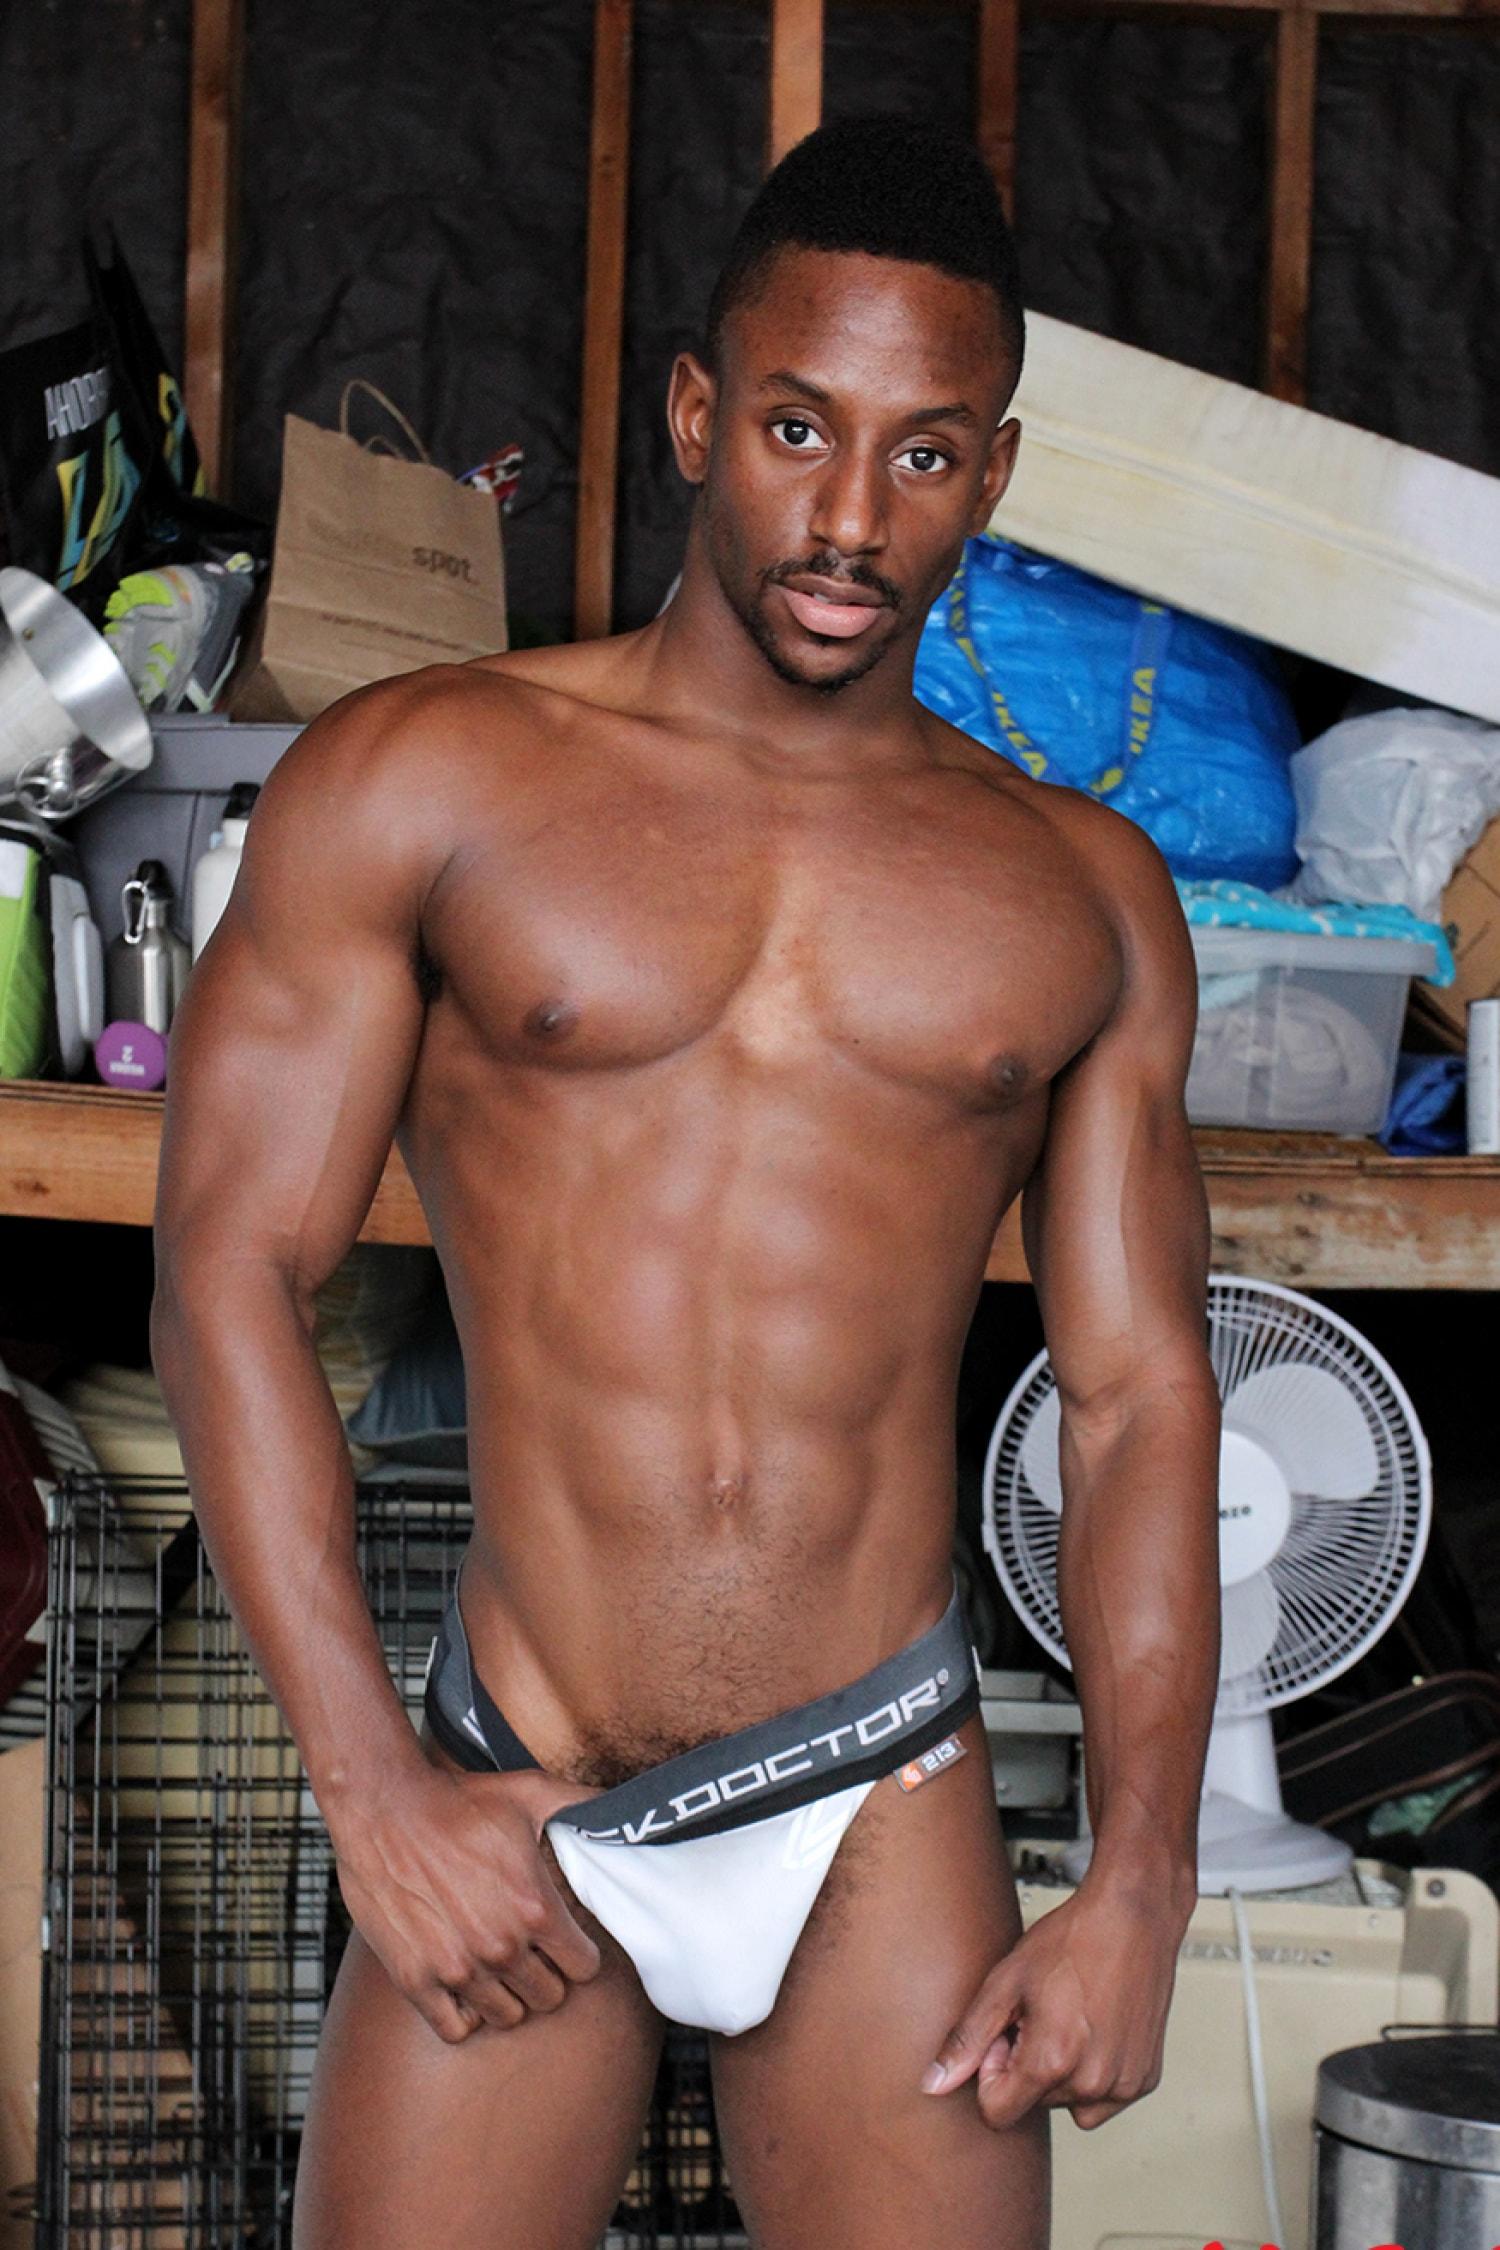 Socks gay naked sword mp4